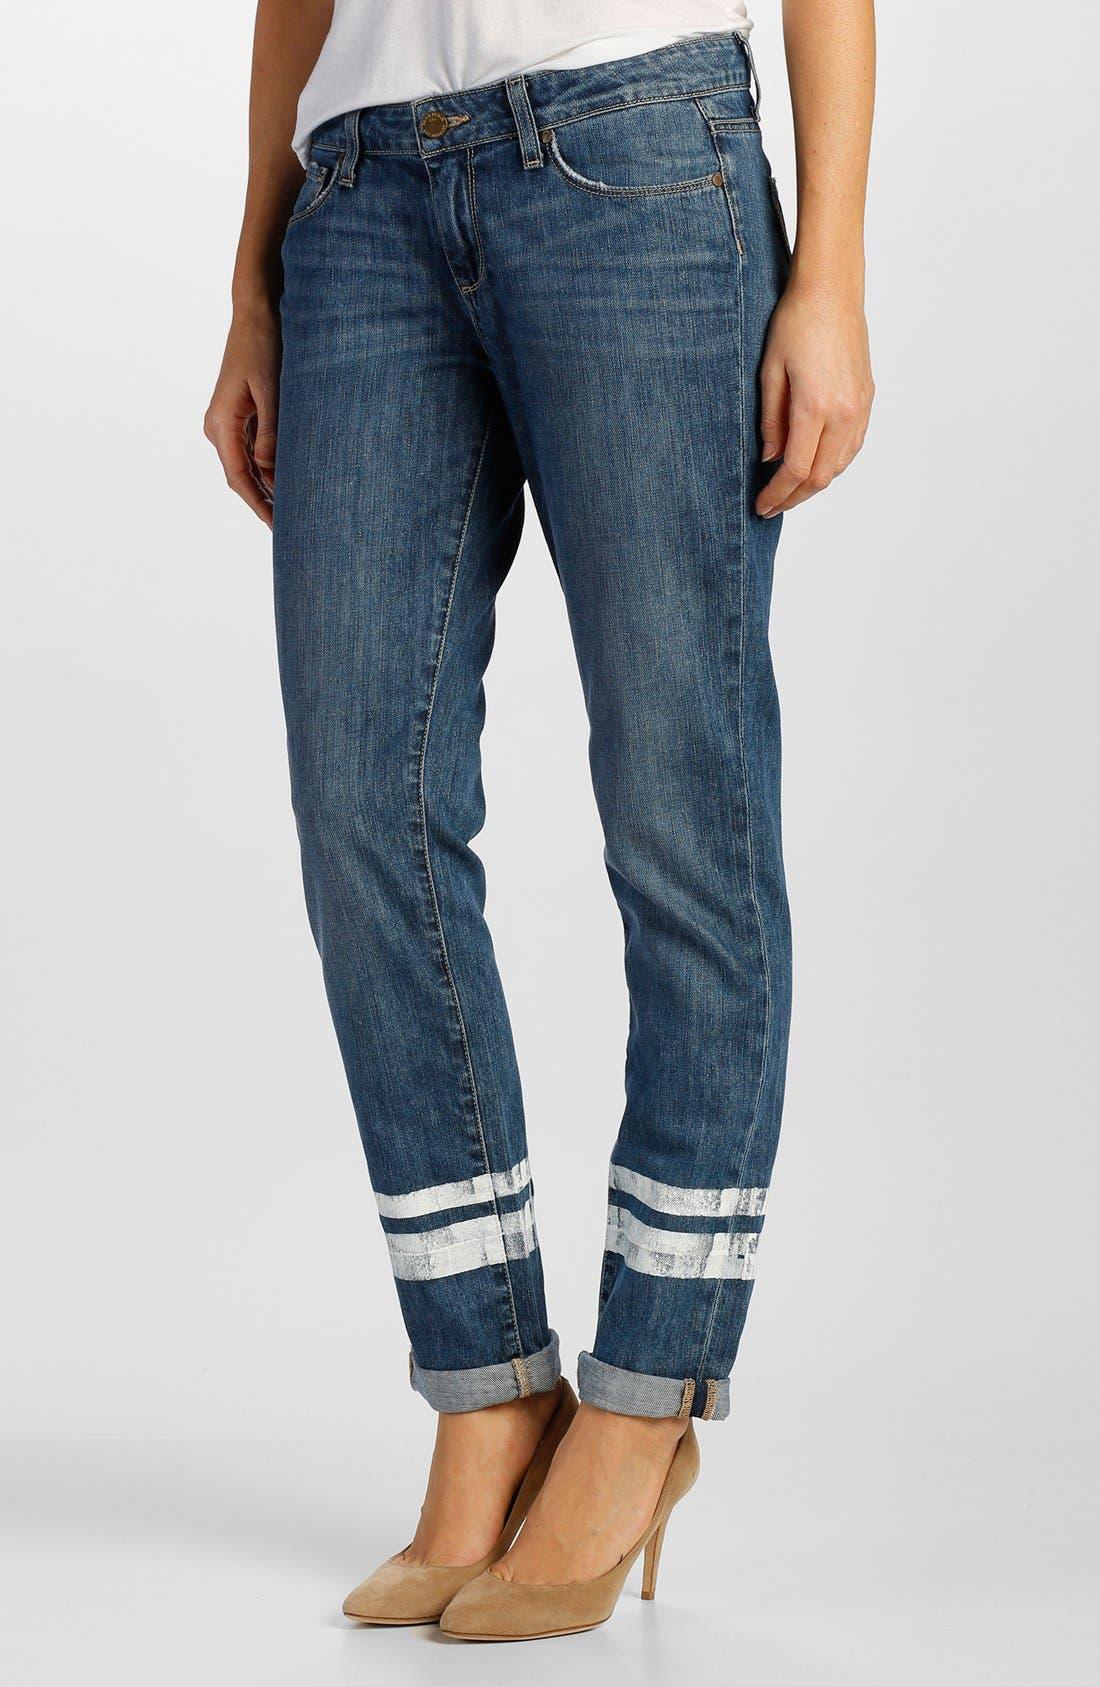 Alternate Image 1 Selected - Paige Denim 'Jimmy Jimmy' Boyfriend Jeans (Painted Stripe)